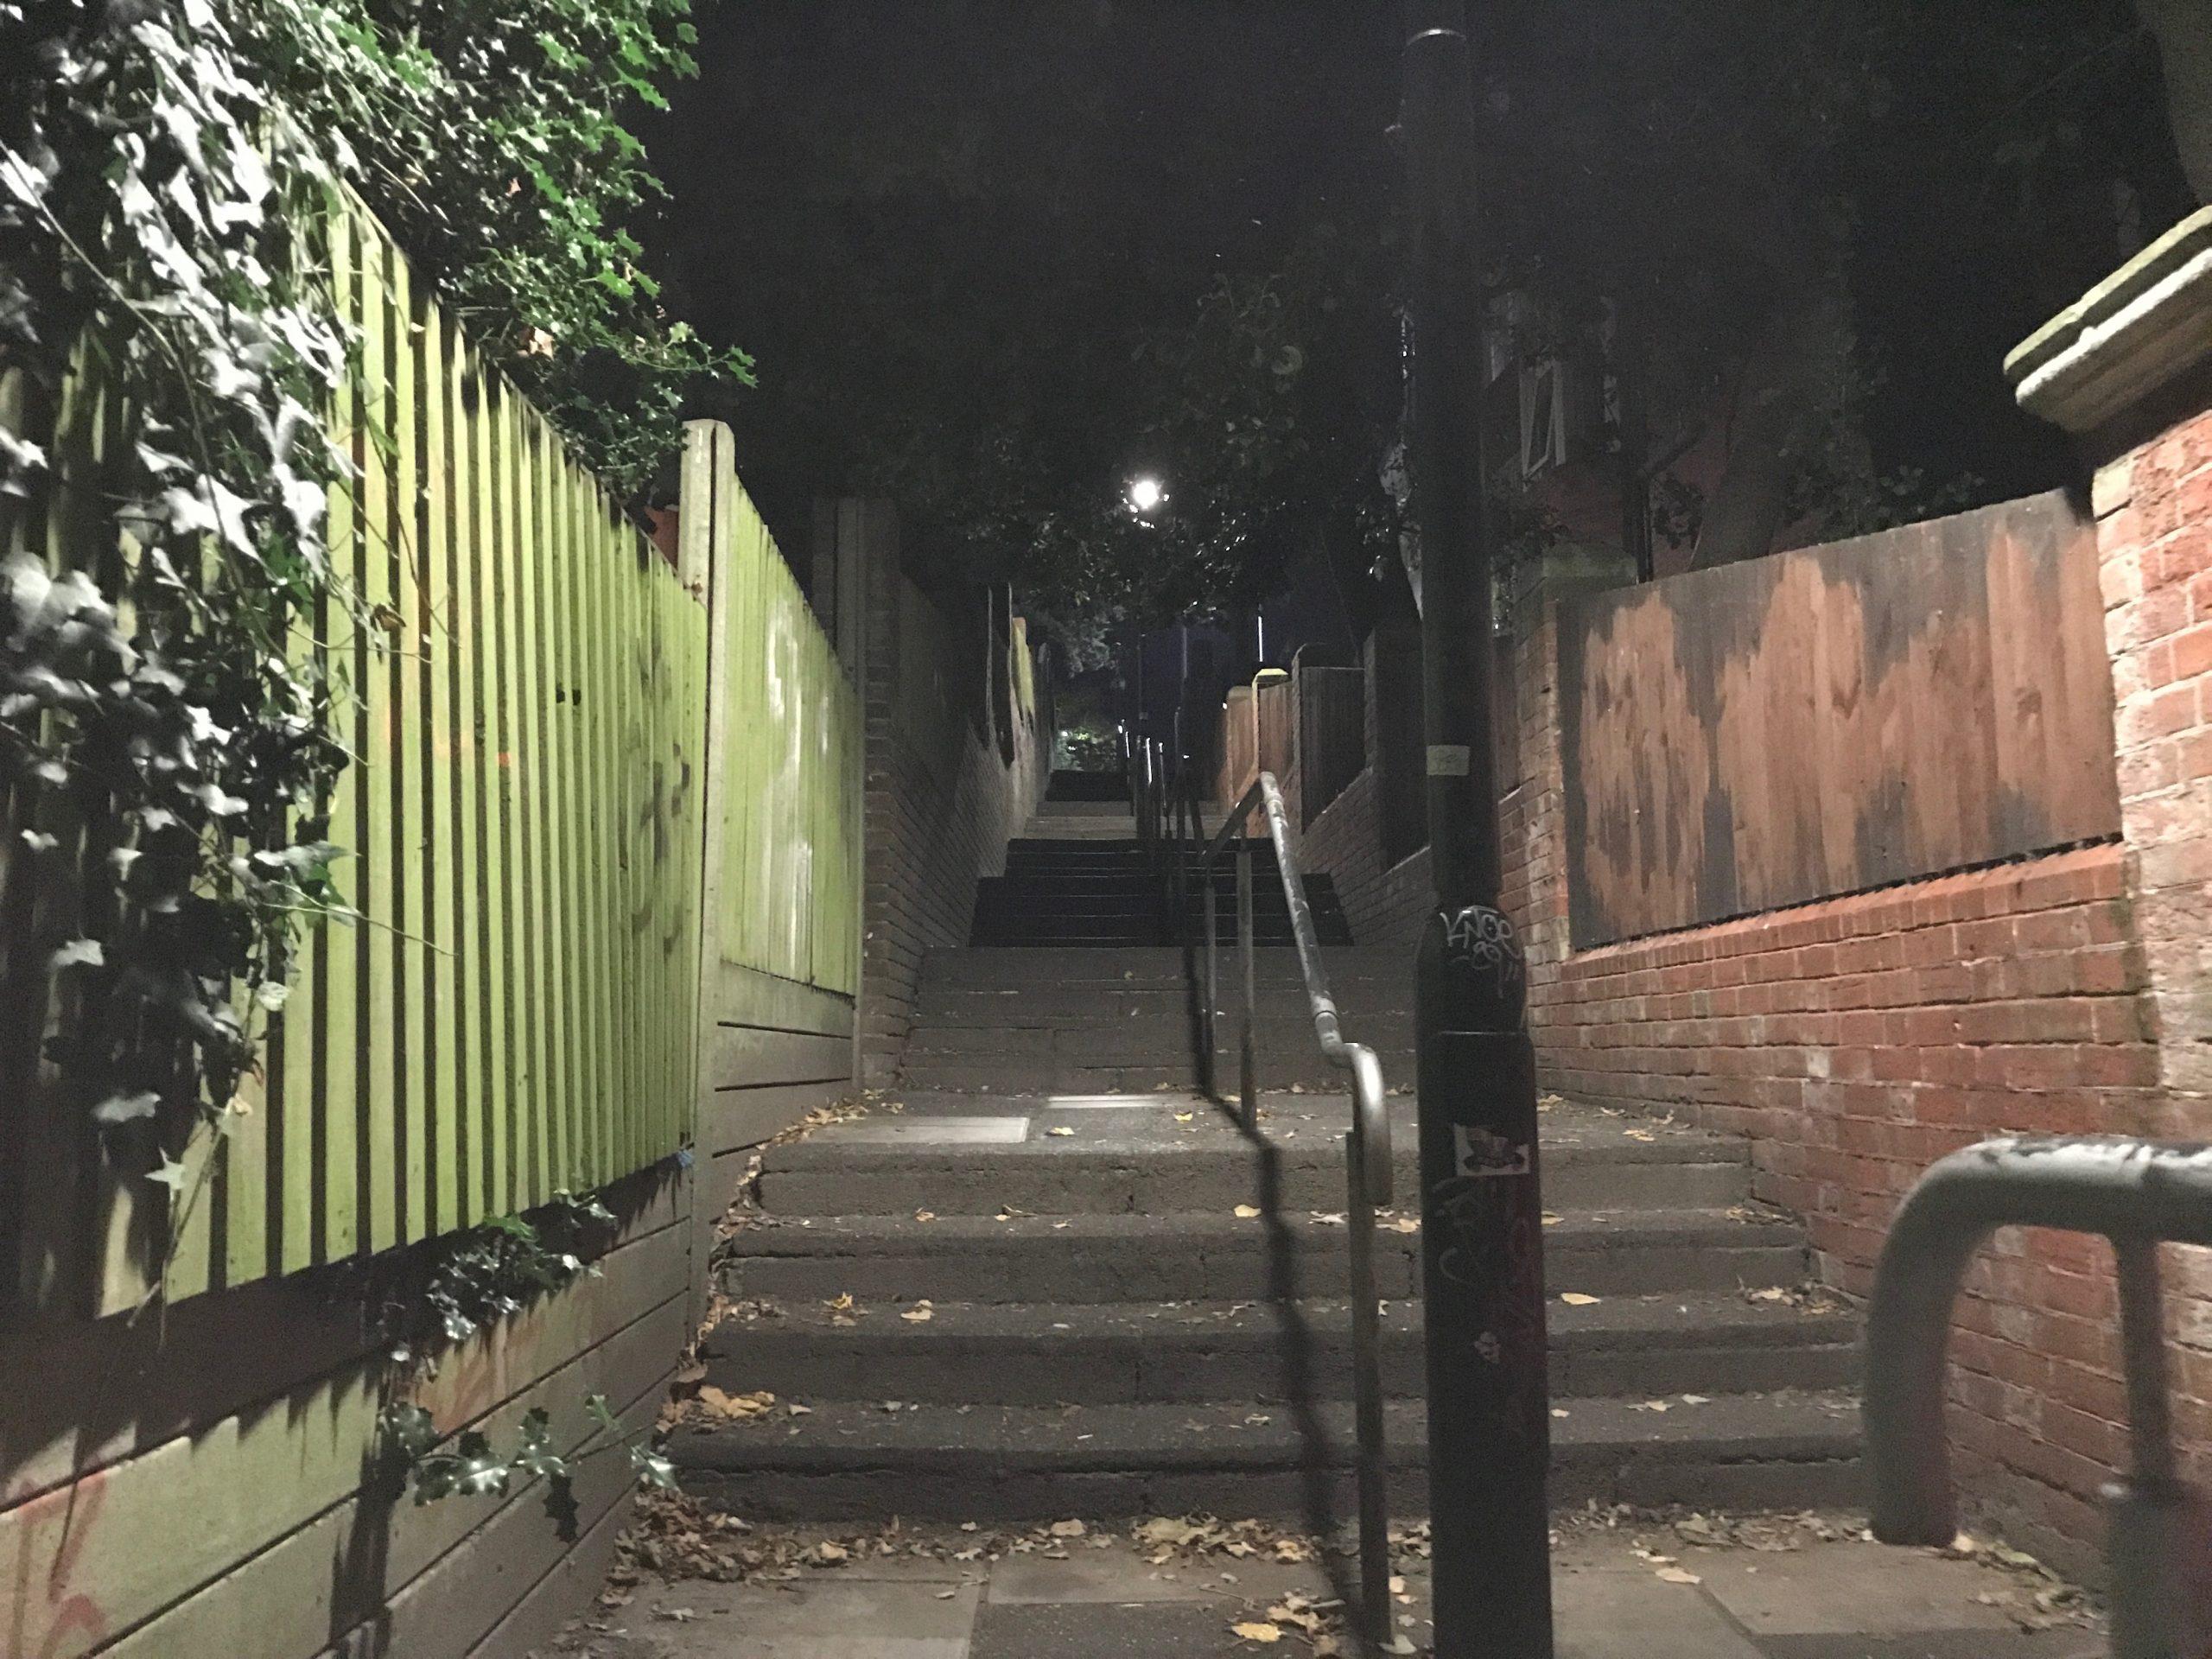 Boscombe Chine steps